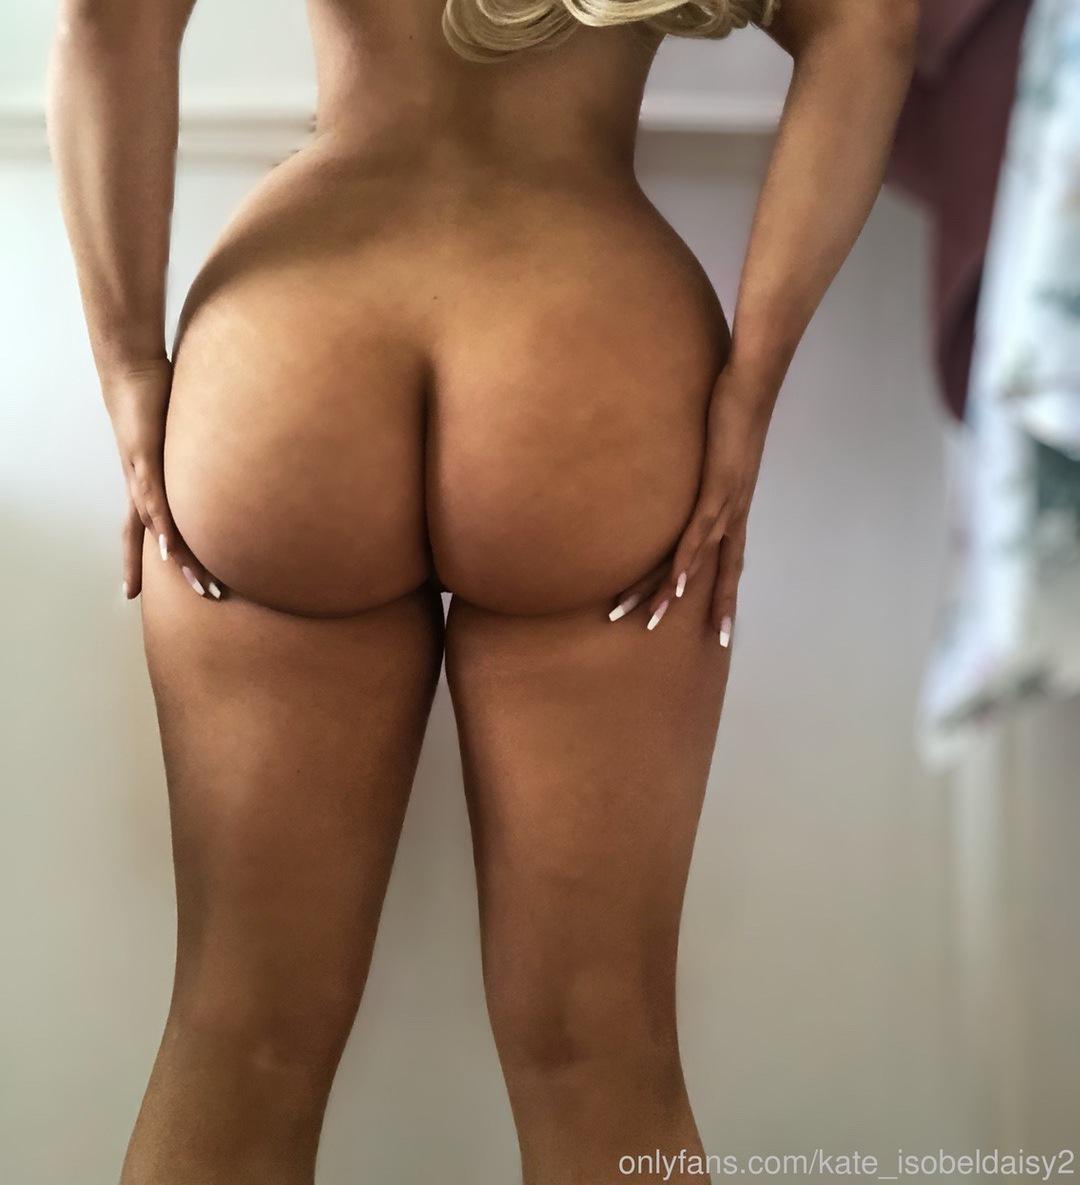 Kate Sharp Kate Isobel Onlyfans Nudes Leaks 0030